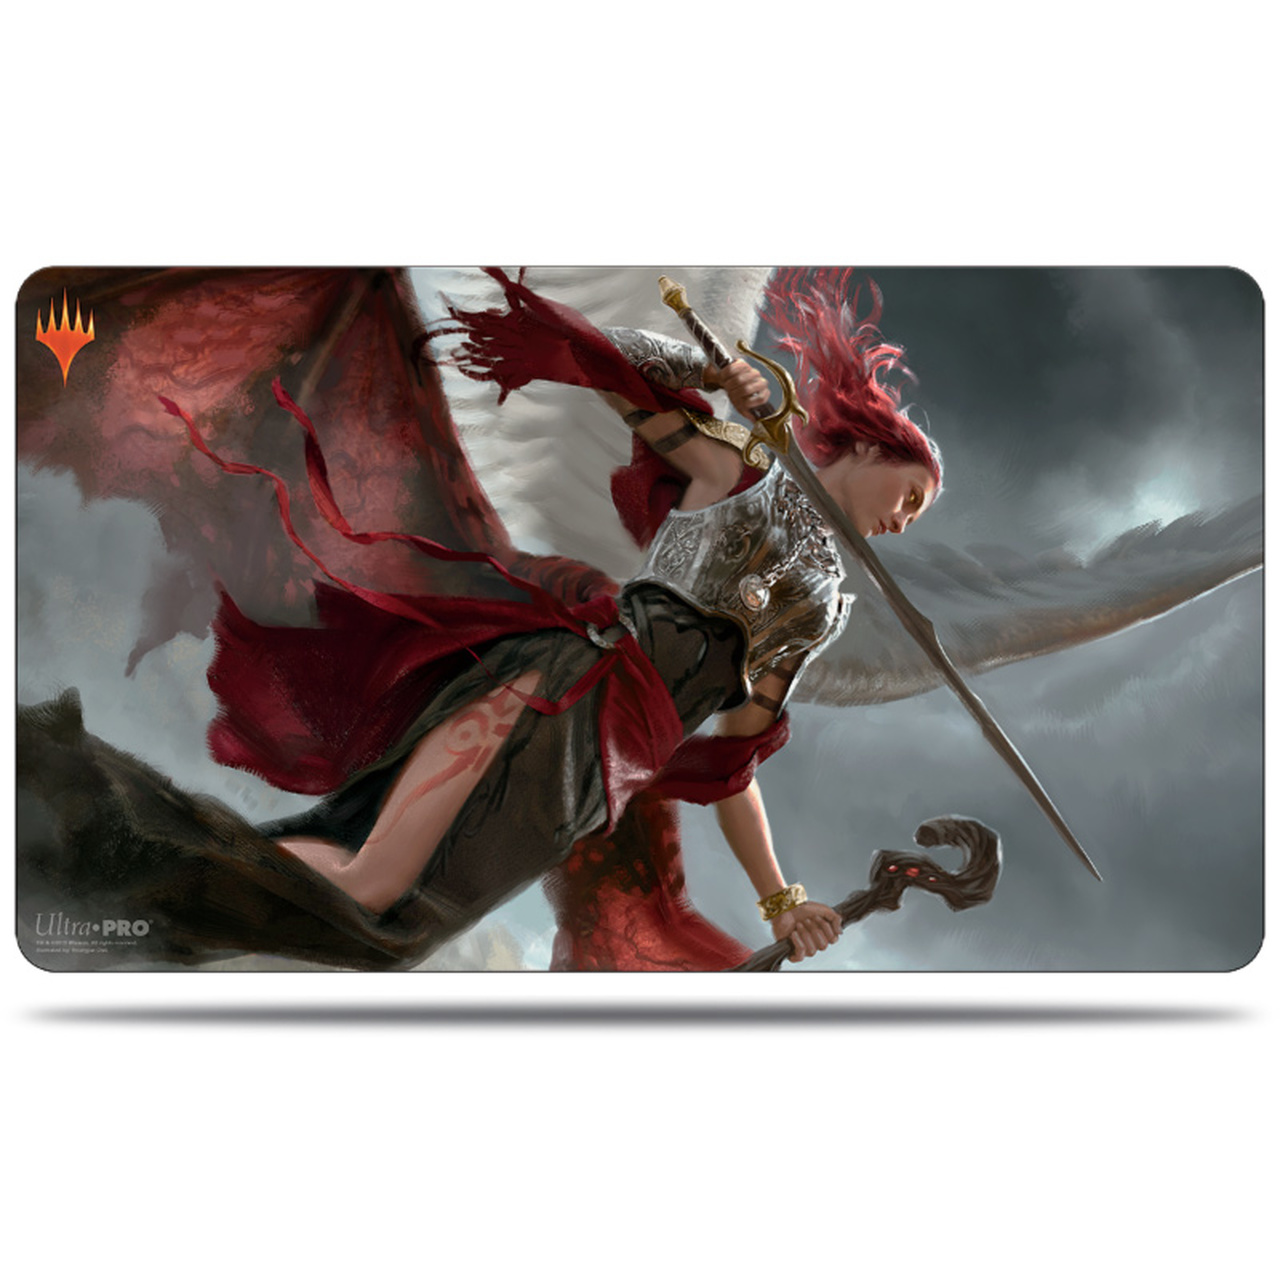 Ultra Pro - MTG Core Set 2020 - Kaalia Play Mat v5